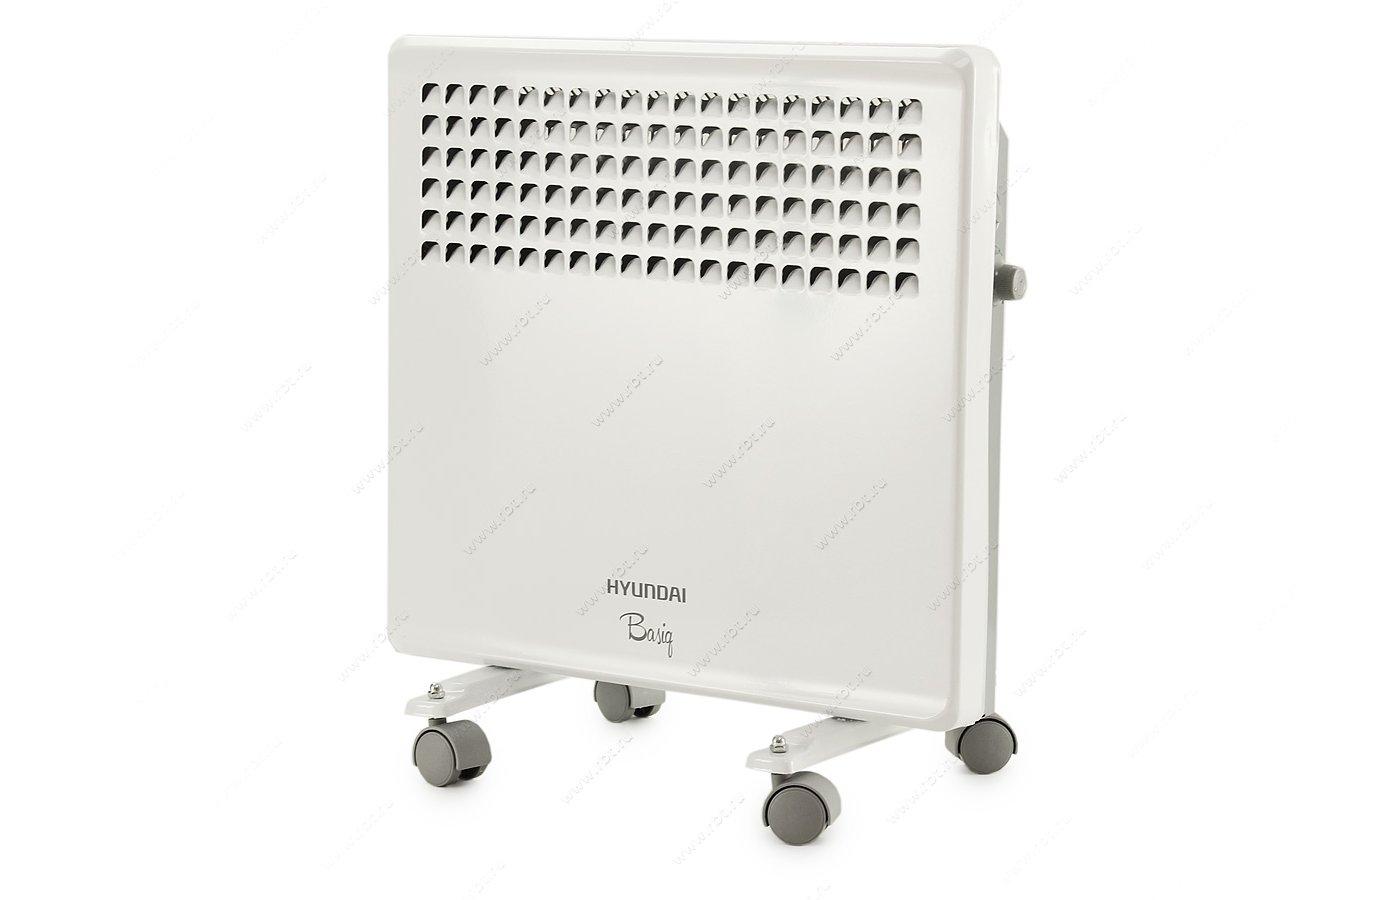 Конвектор HYUNDAI H-HV5-10-UI609